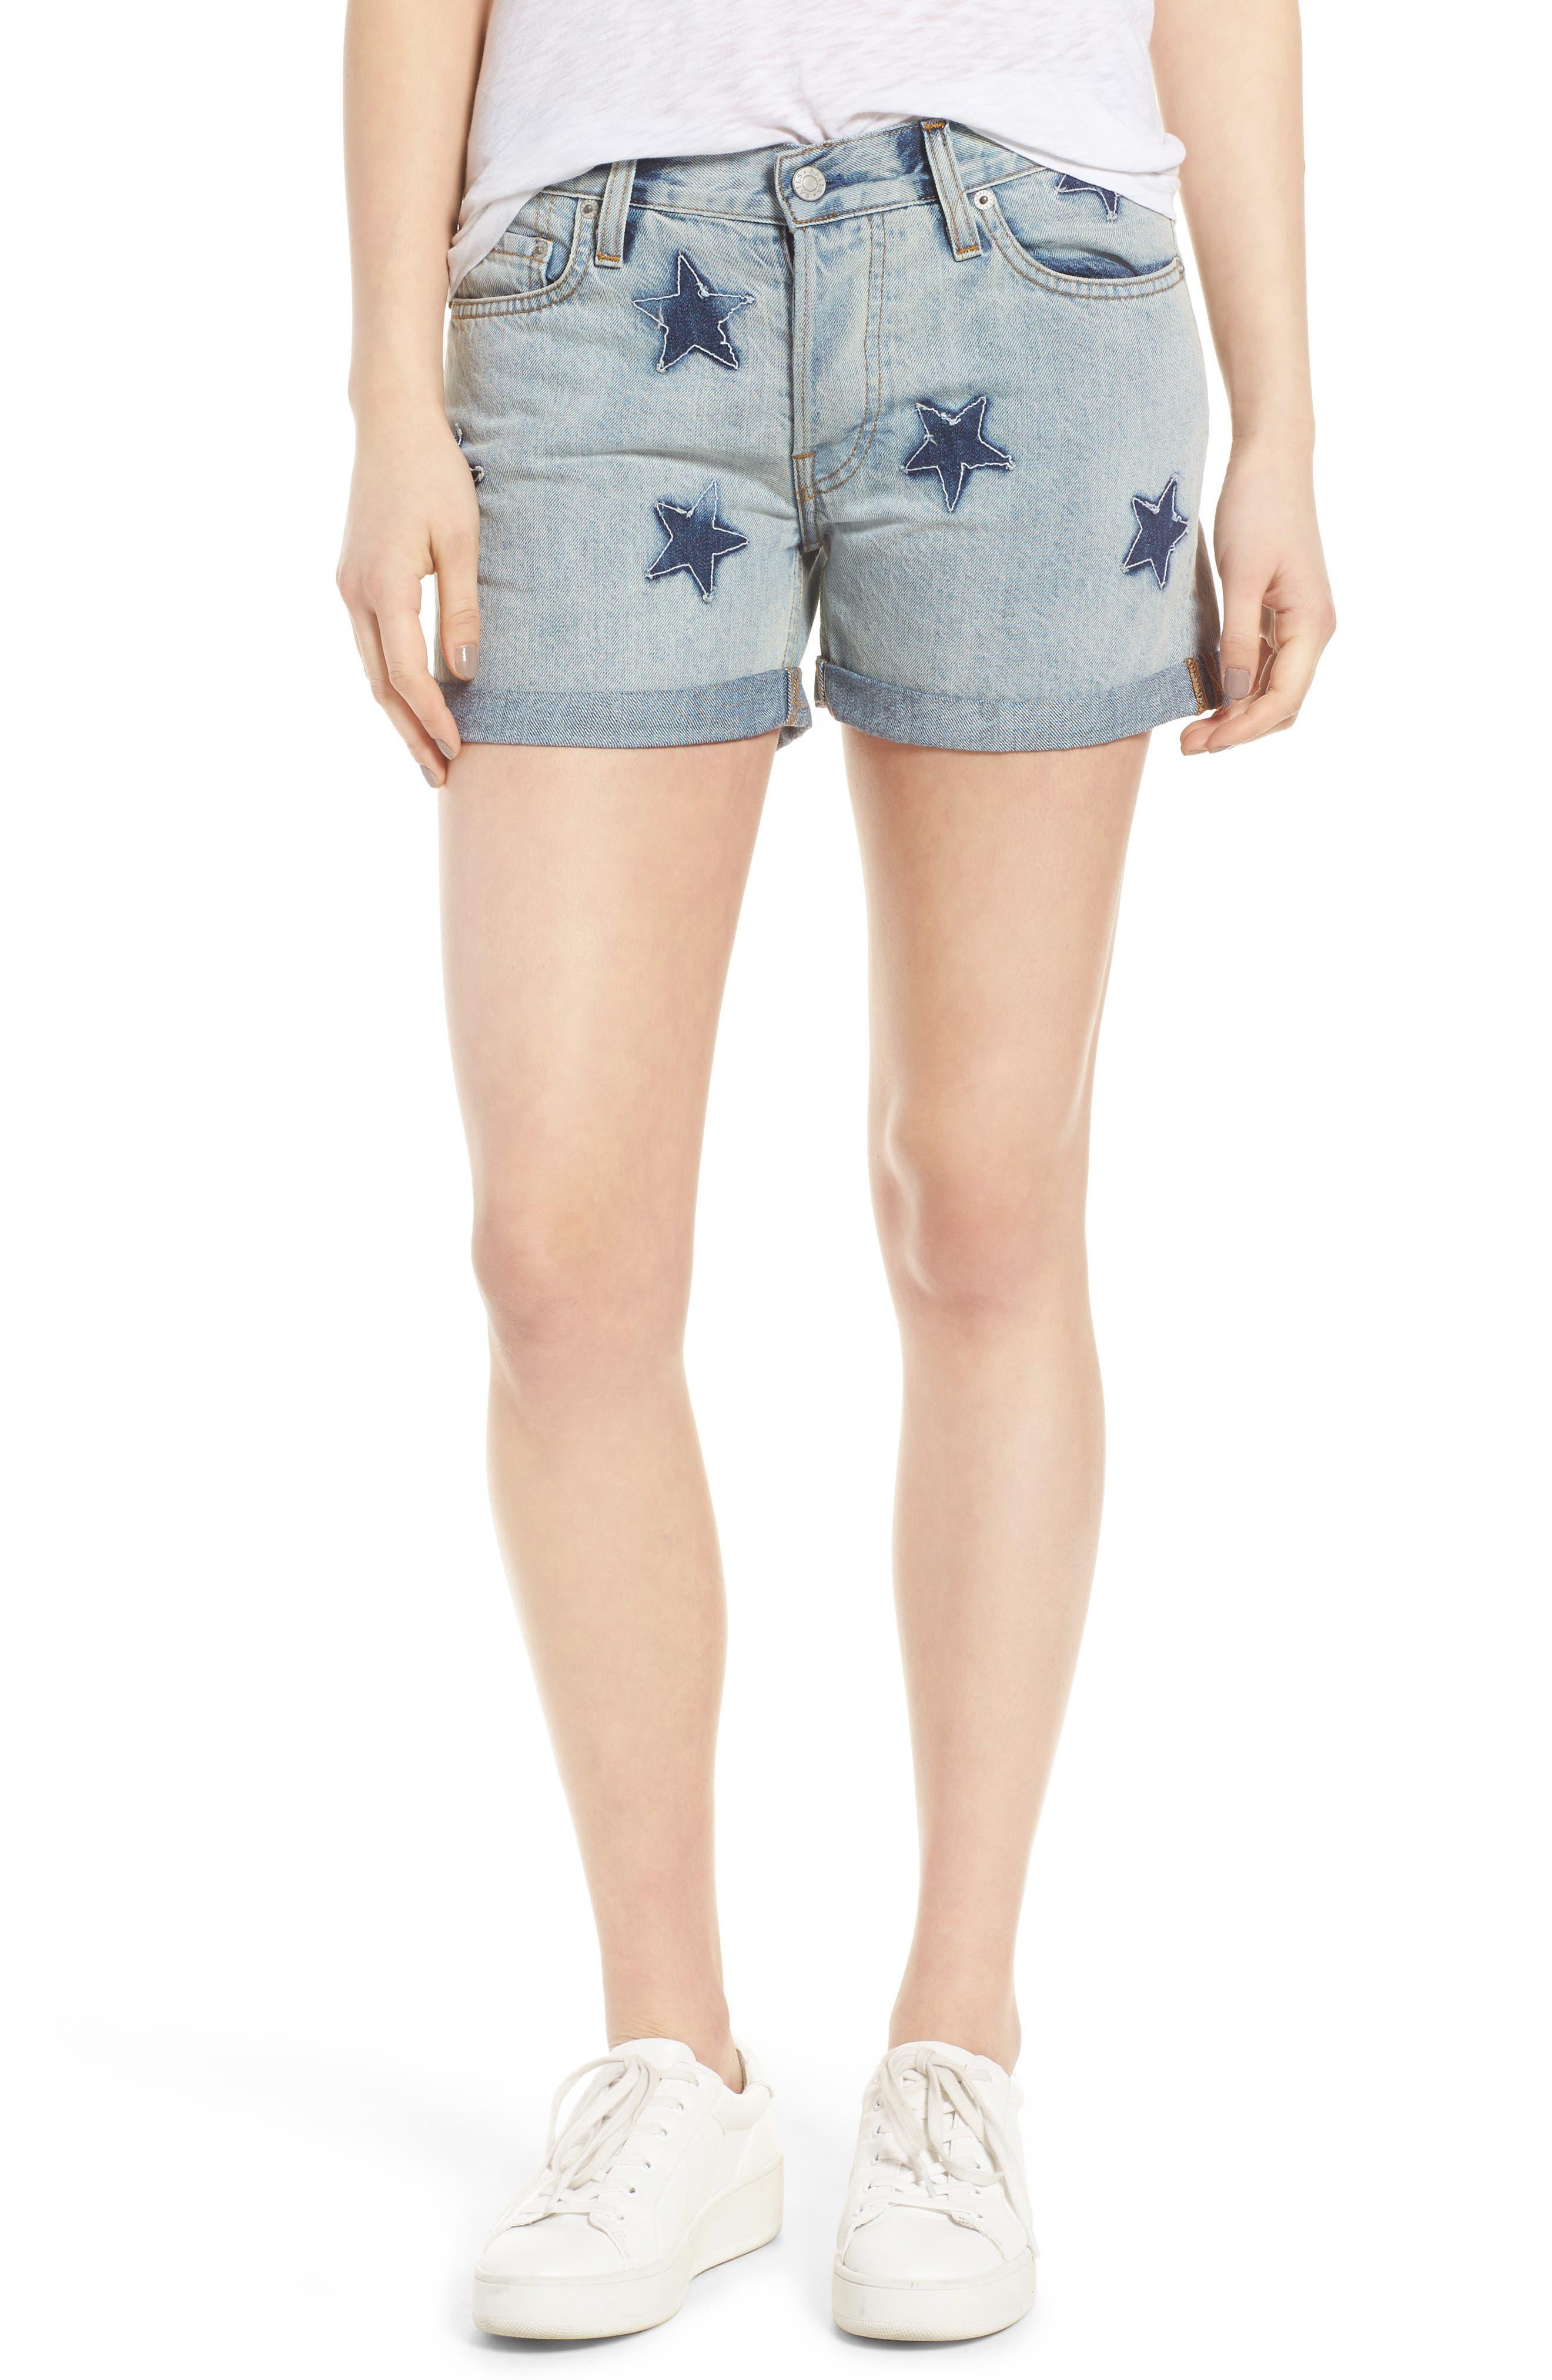 RAILS Logan Cuffed Denim Shorts